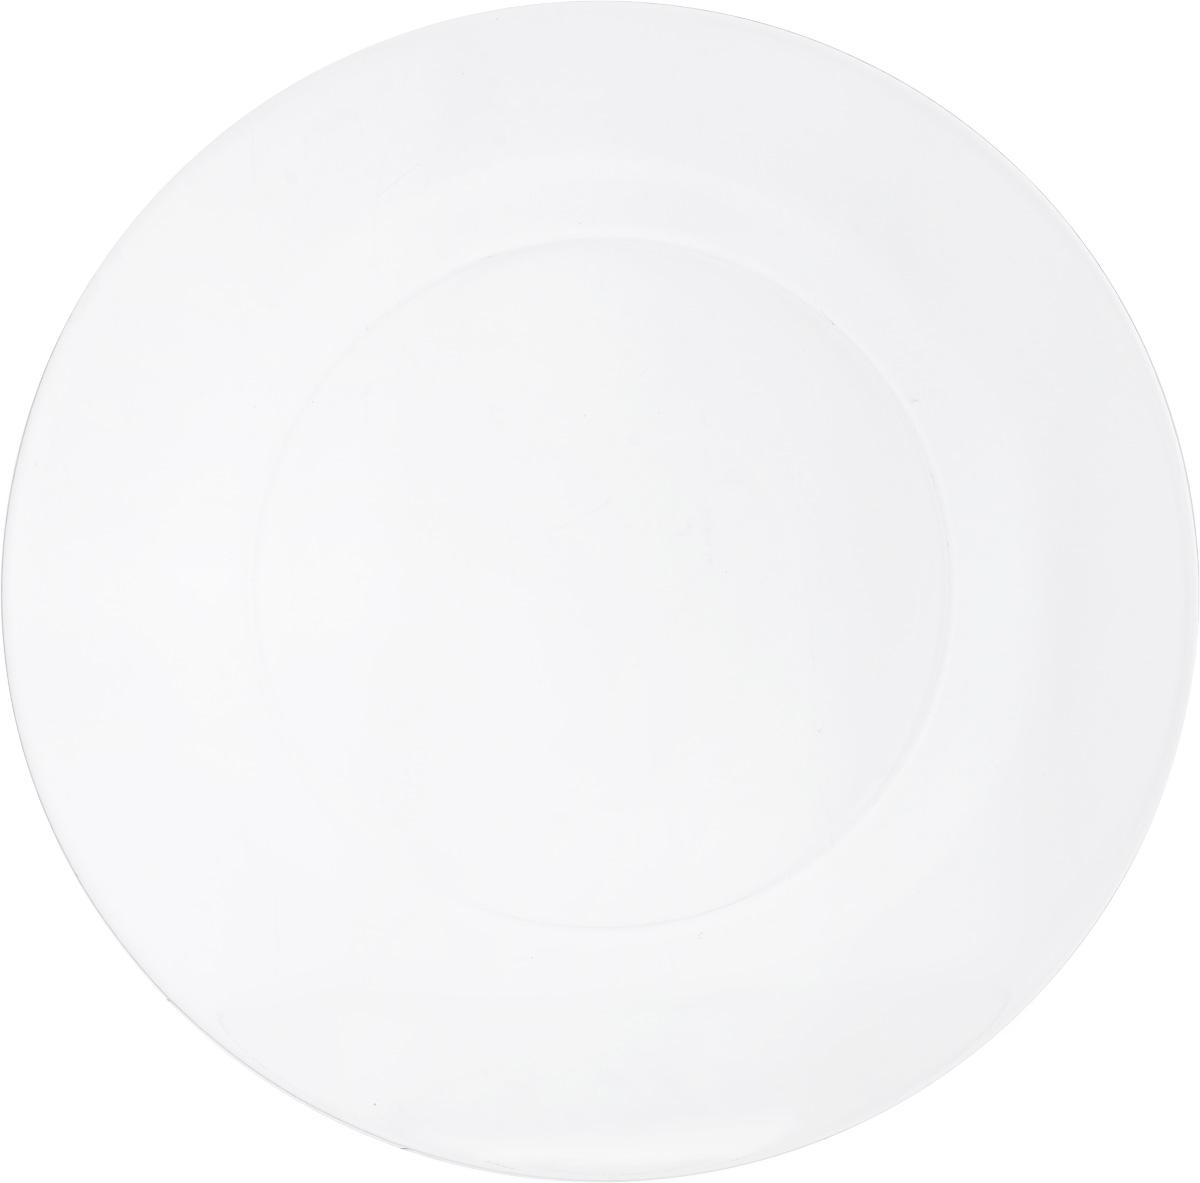 Тарелка обеденная OSZ Симпатия, диаметр 25 см16C1886Тарелка обеденная OSZ Симпатия выполнена из стекла. Диаметр тарелки (по верхнему краю): 25 см.